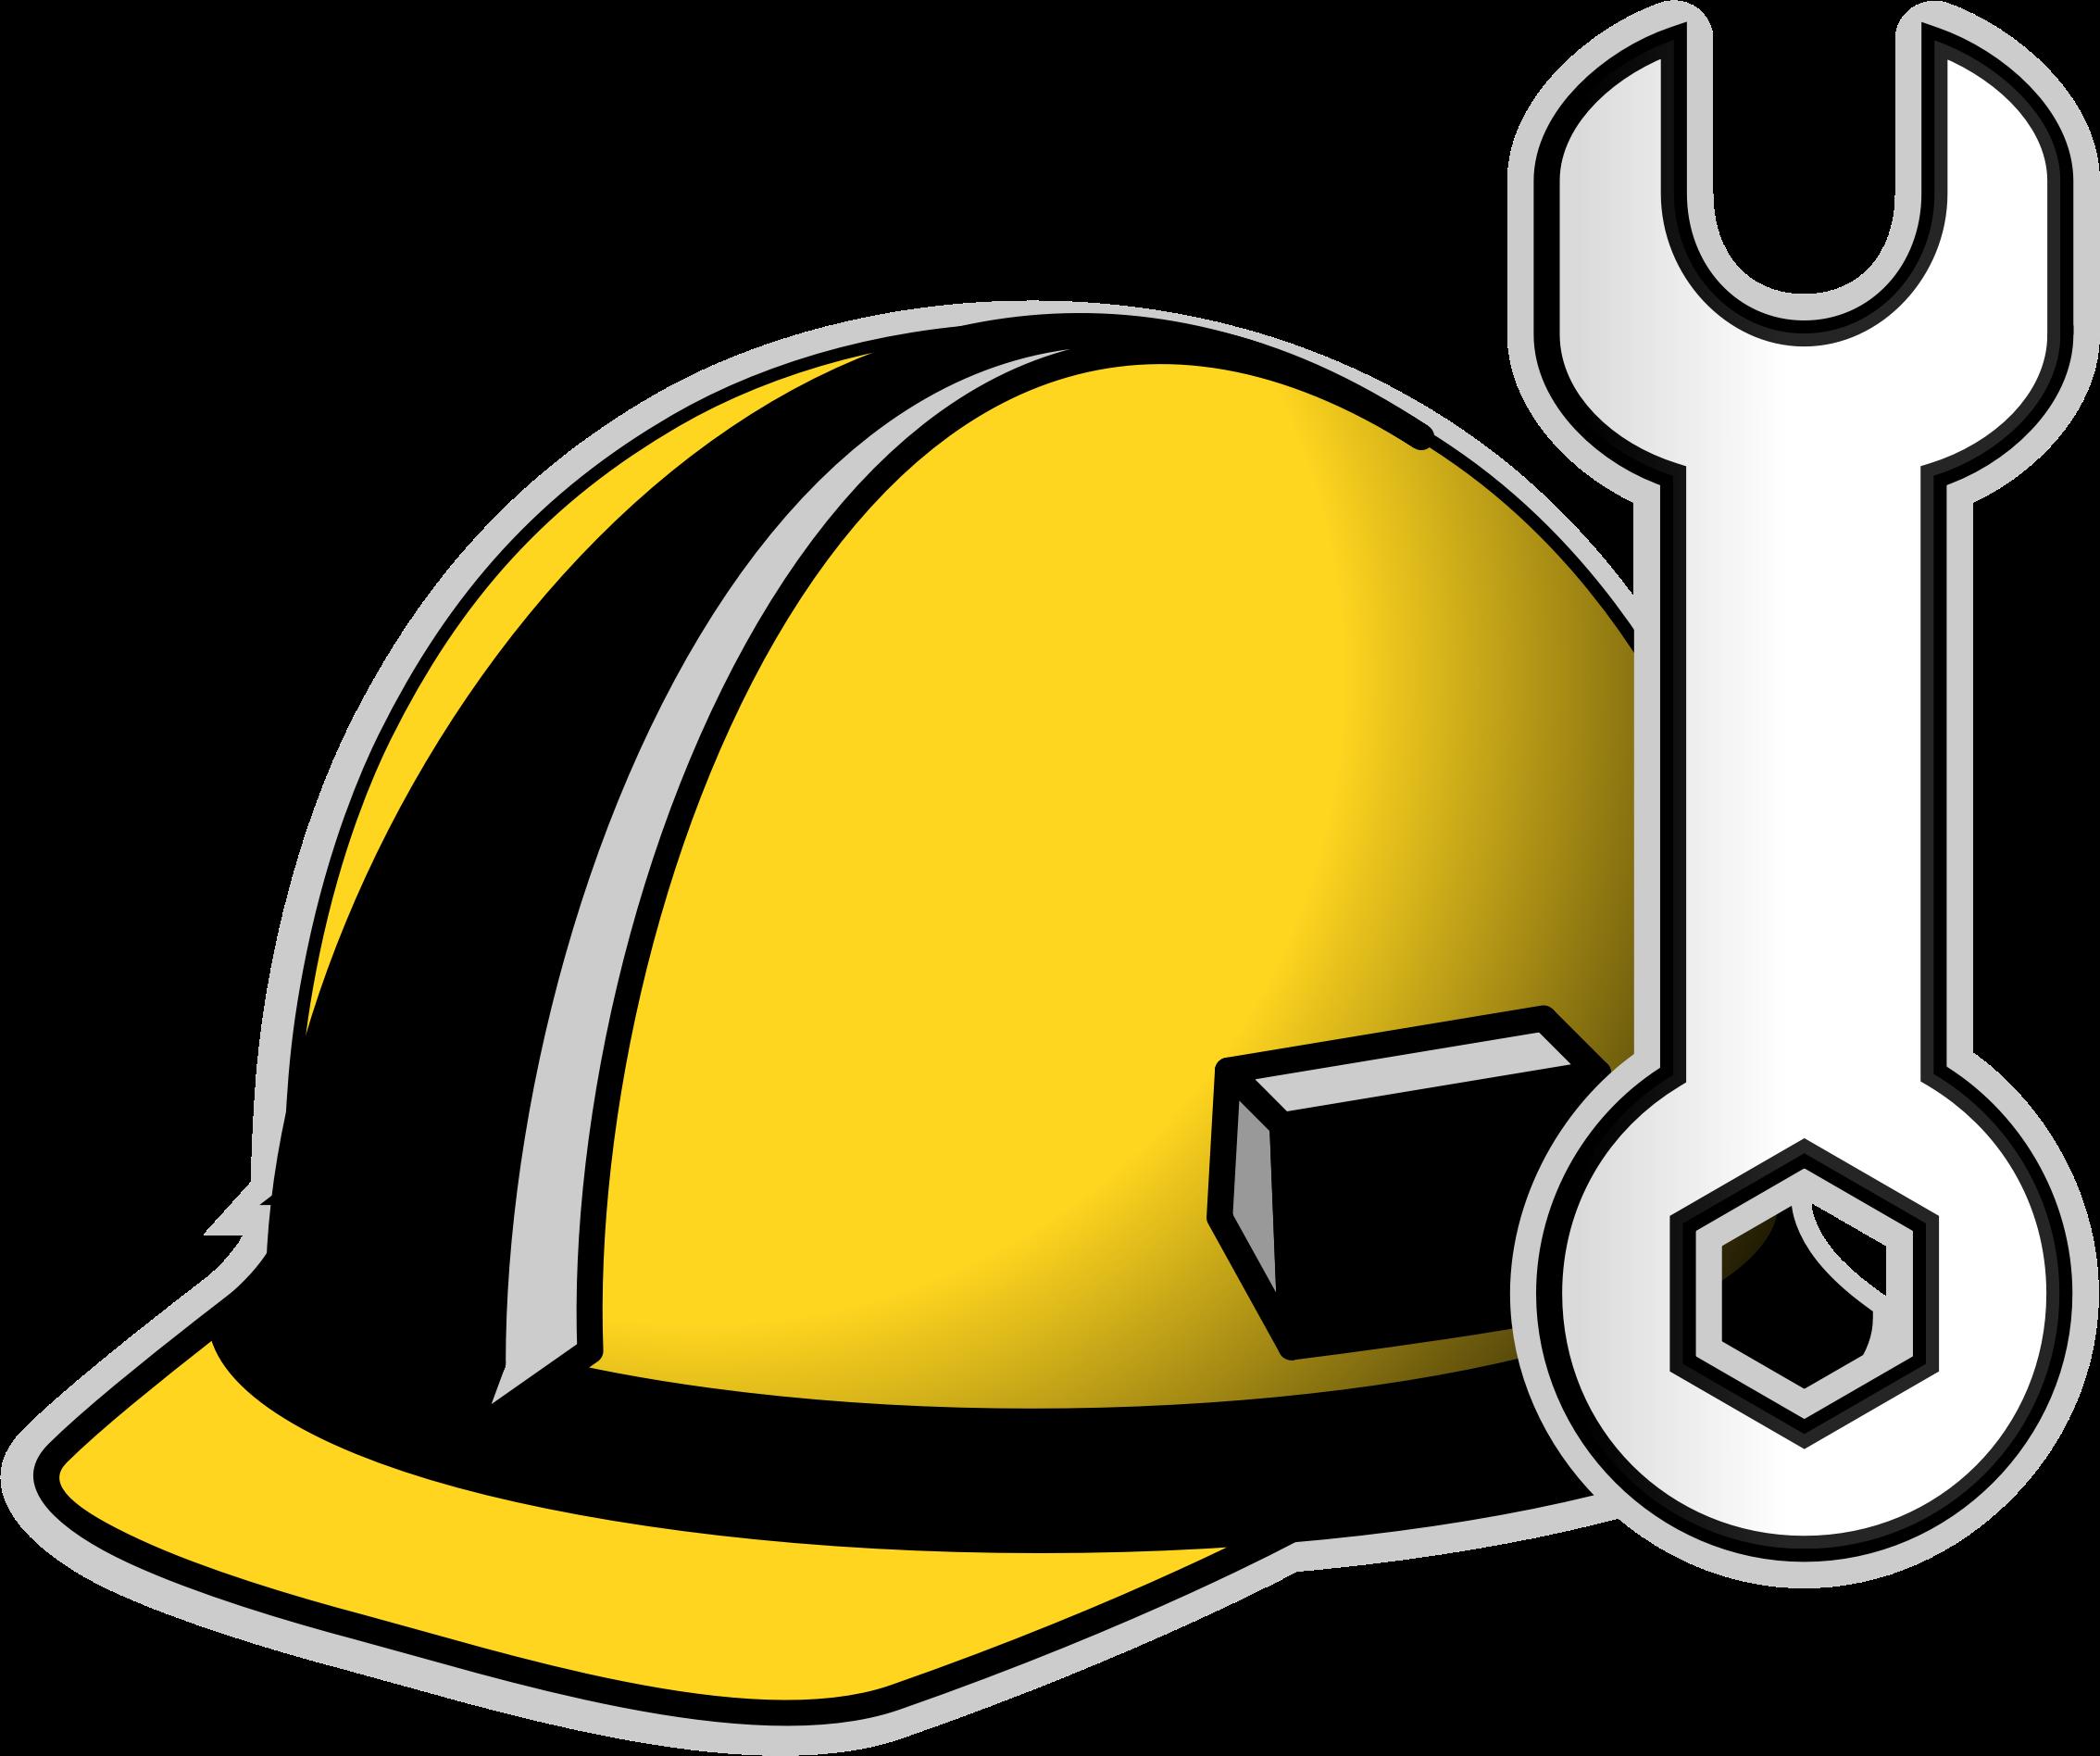 Hard hat big image. Engineering clipart border